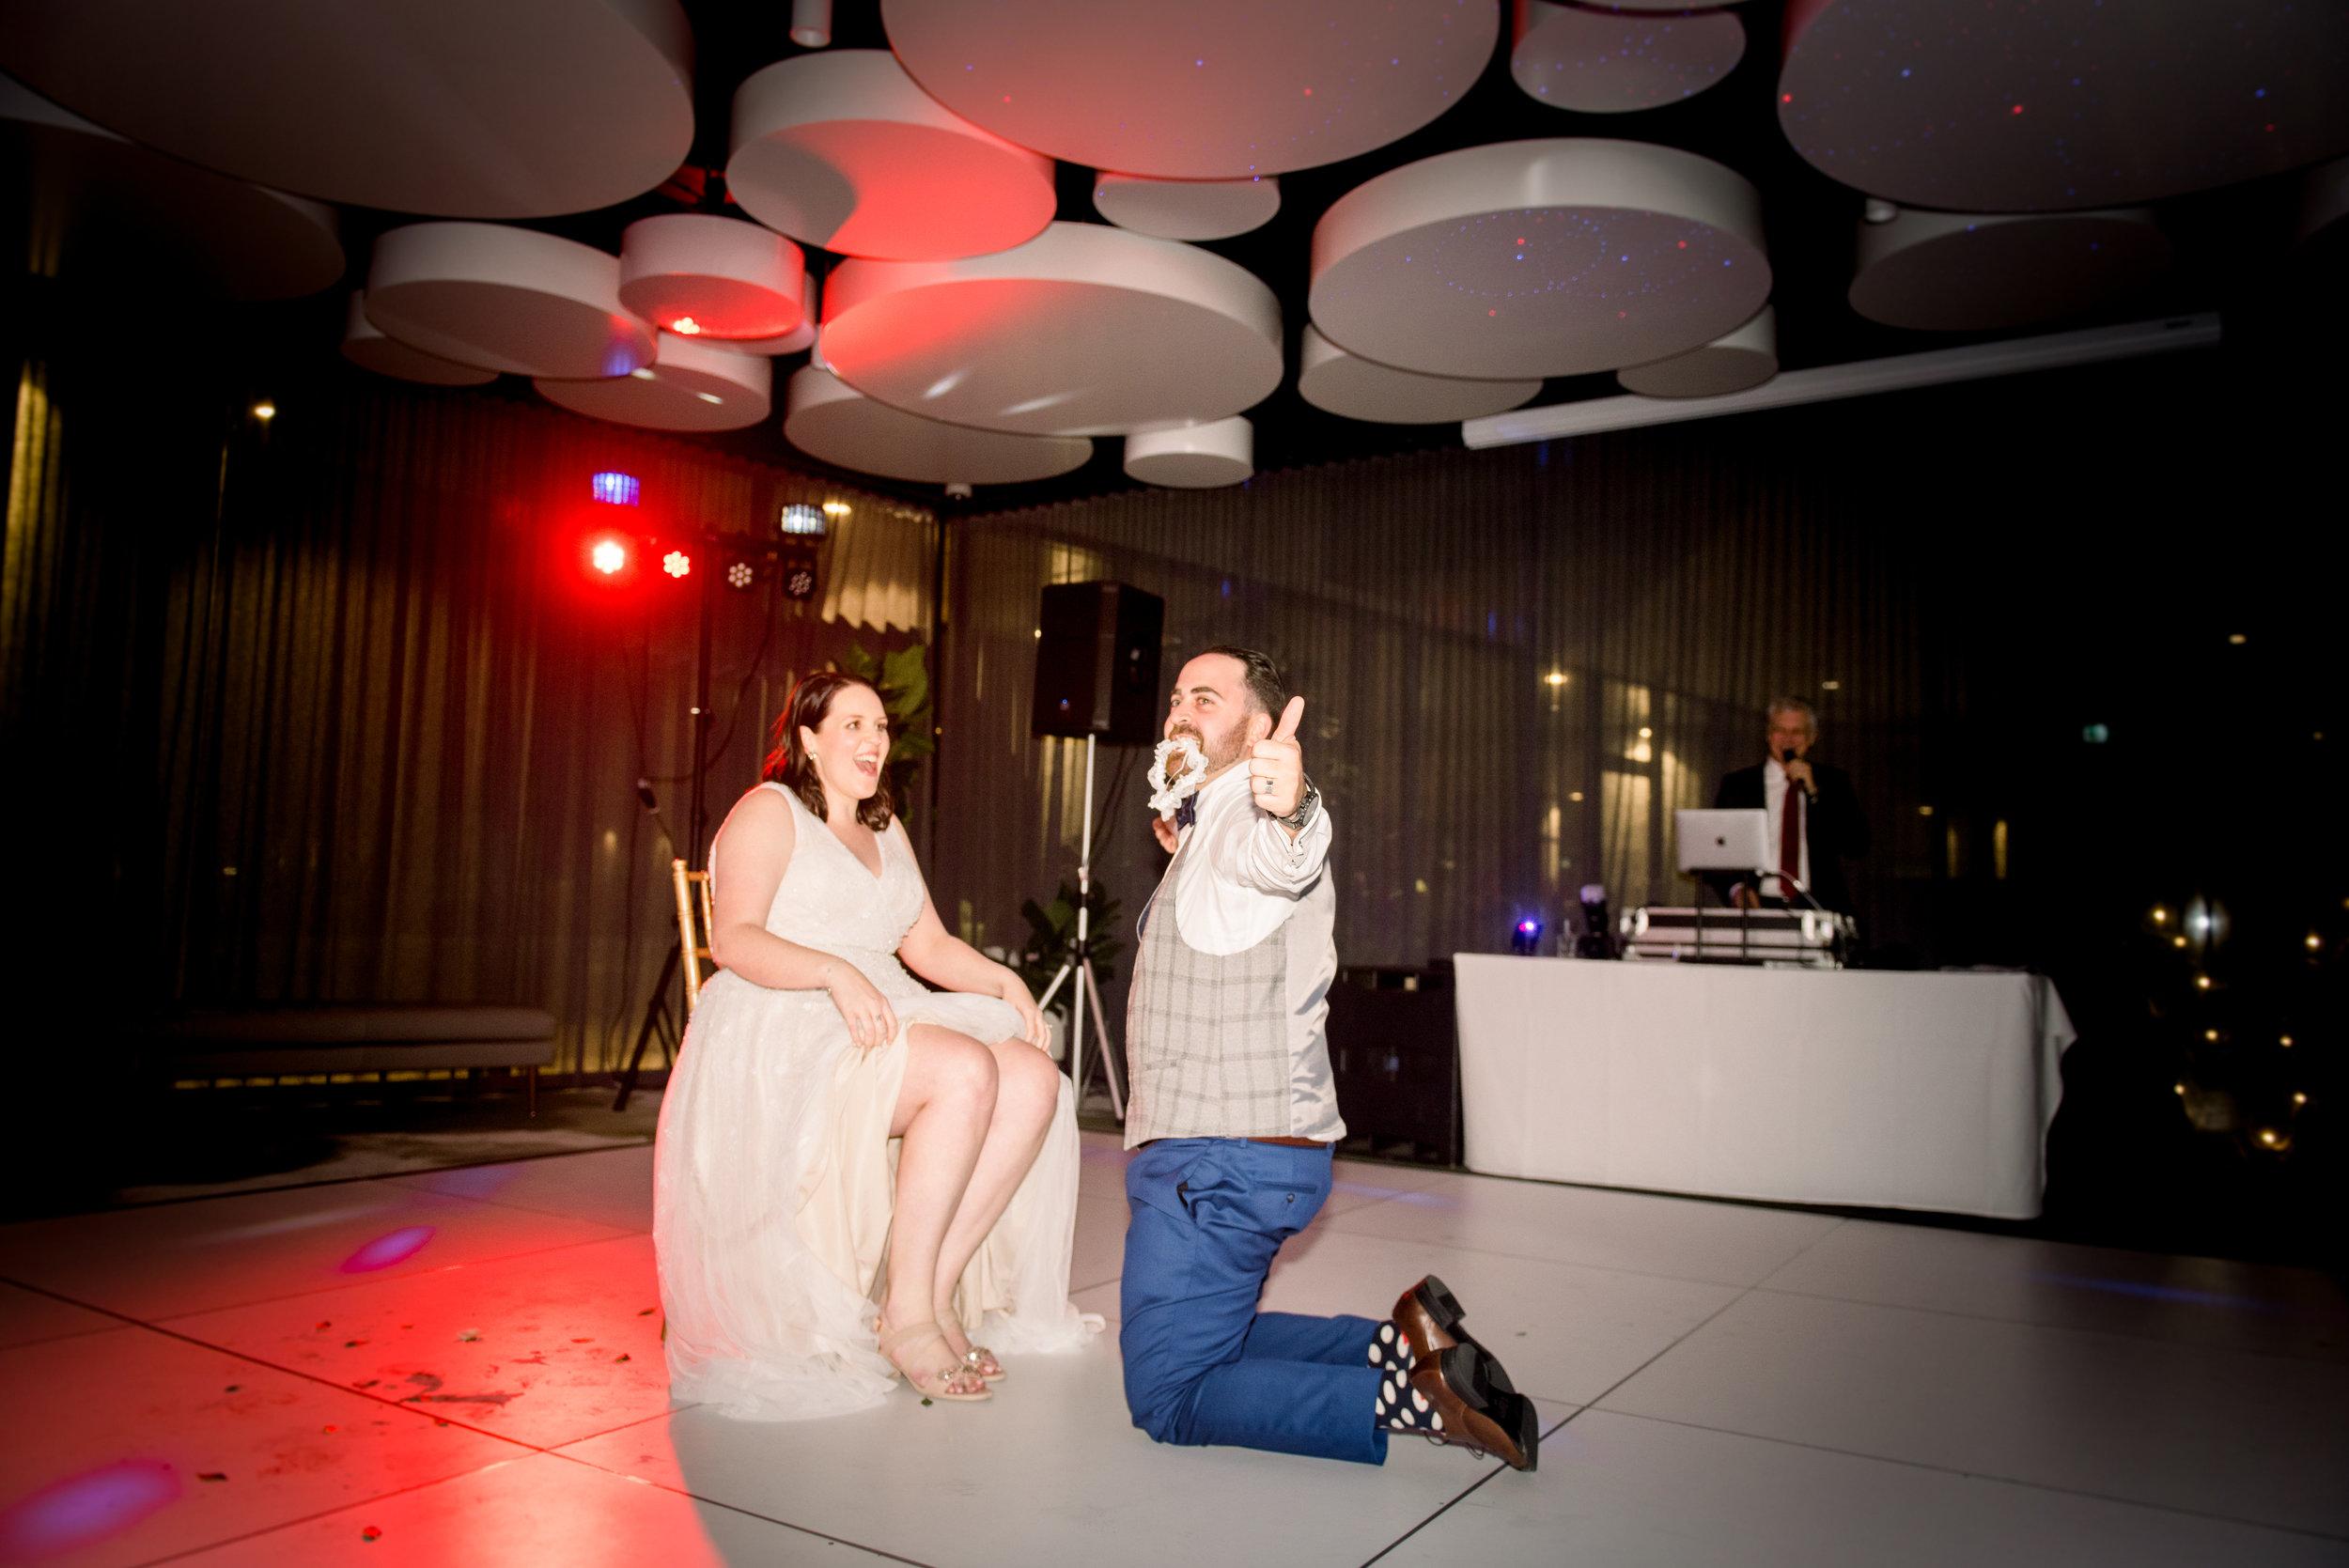 brisbane-city-wedding-photographer-romantic-wedding-141.jpg